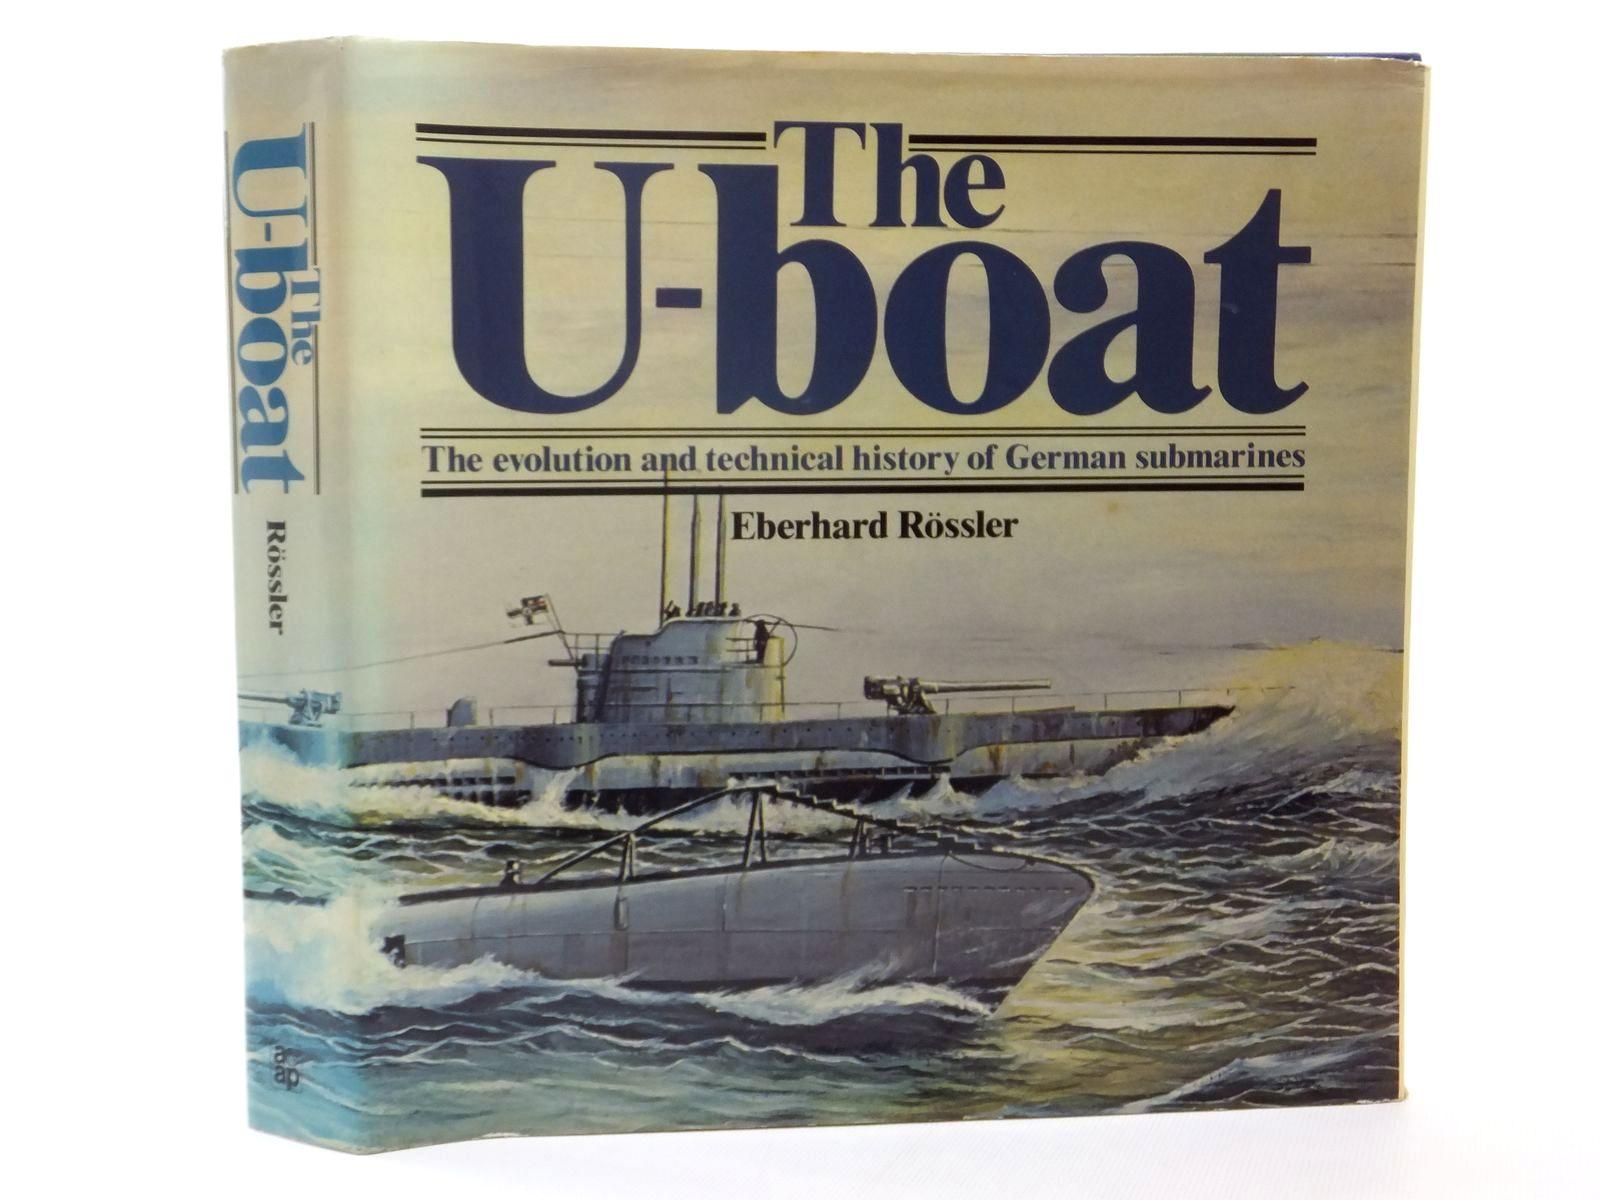 rare books, collectible books & 2nd hand navy books : stella